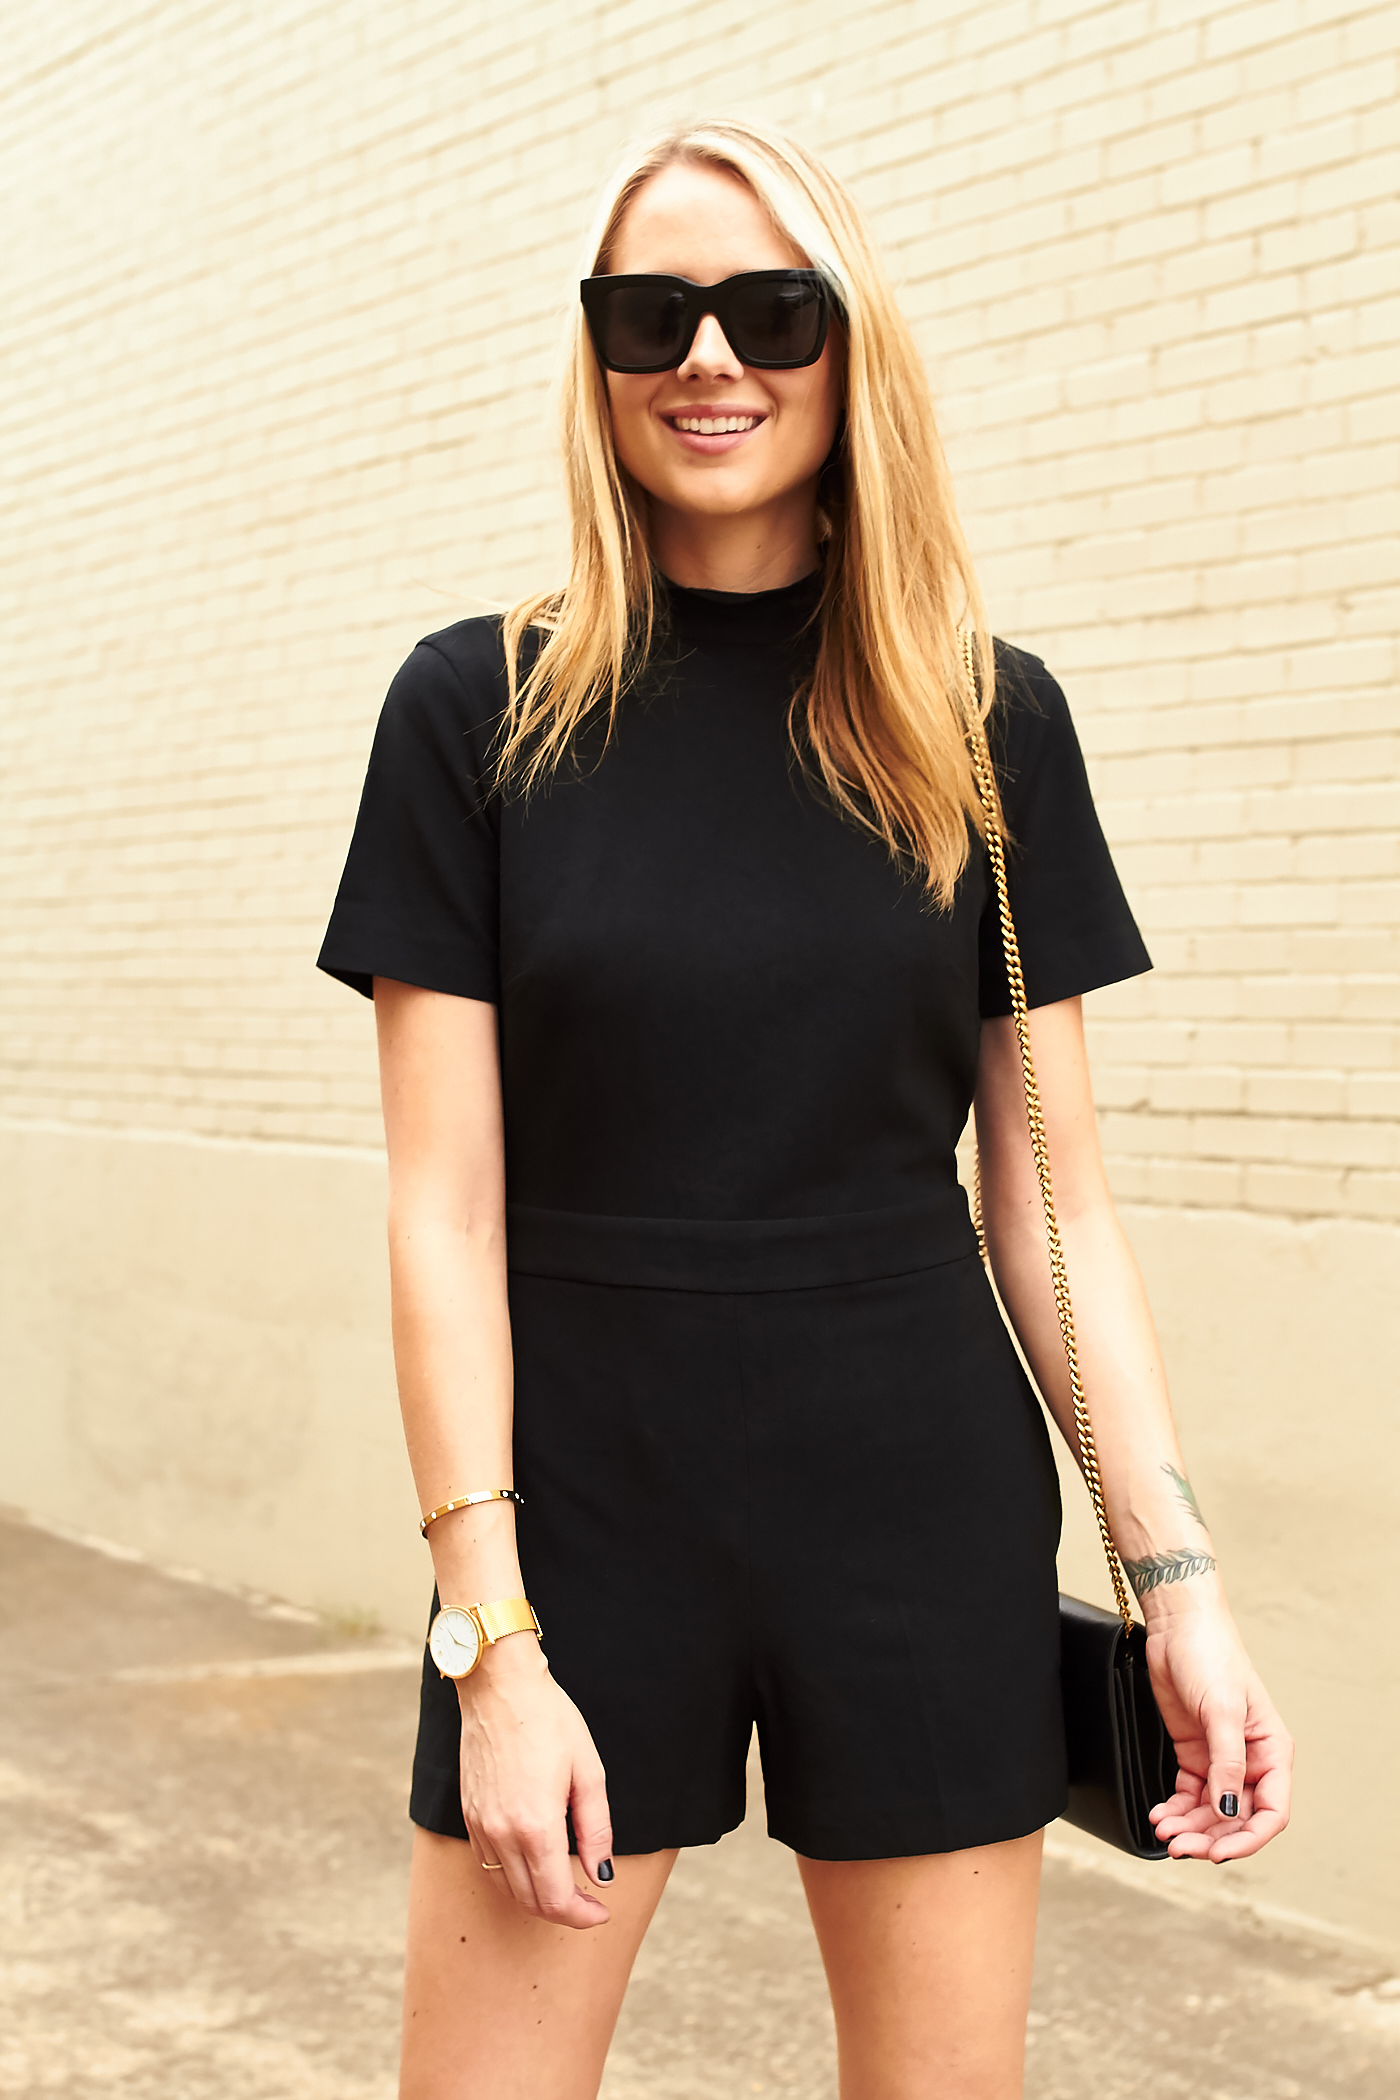 fashion-jackson-black-celine-sunglasses-club-monaco-philena-romper